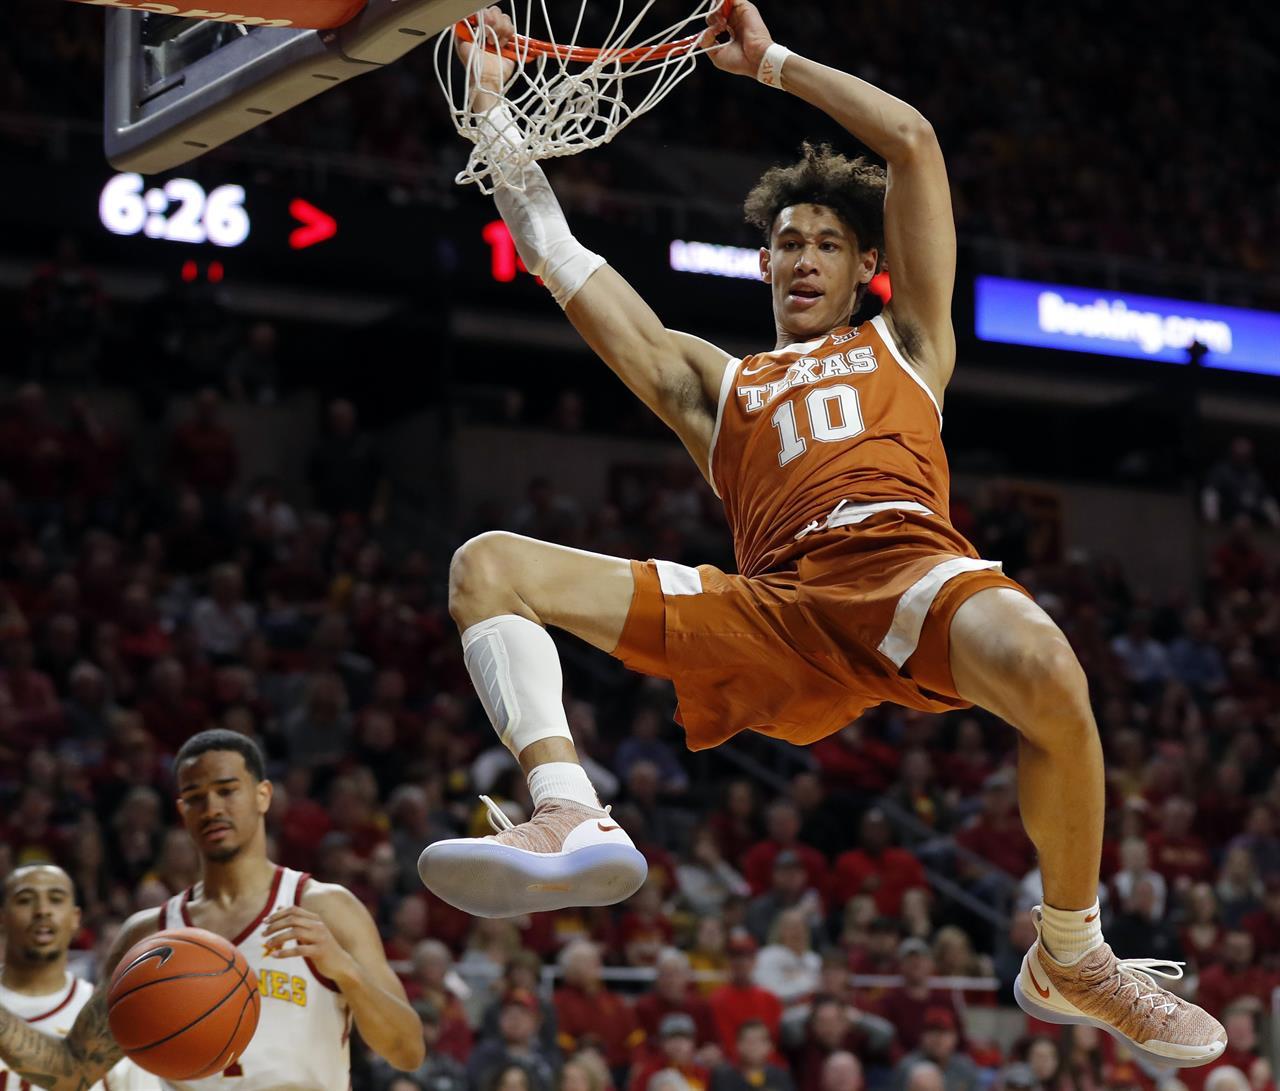 Texas' Jaxson Hayes headlines list of big men in NBA draft   The